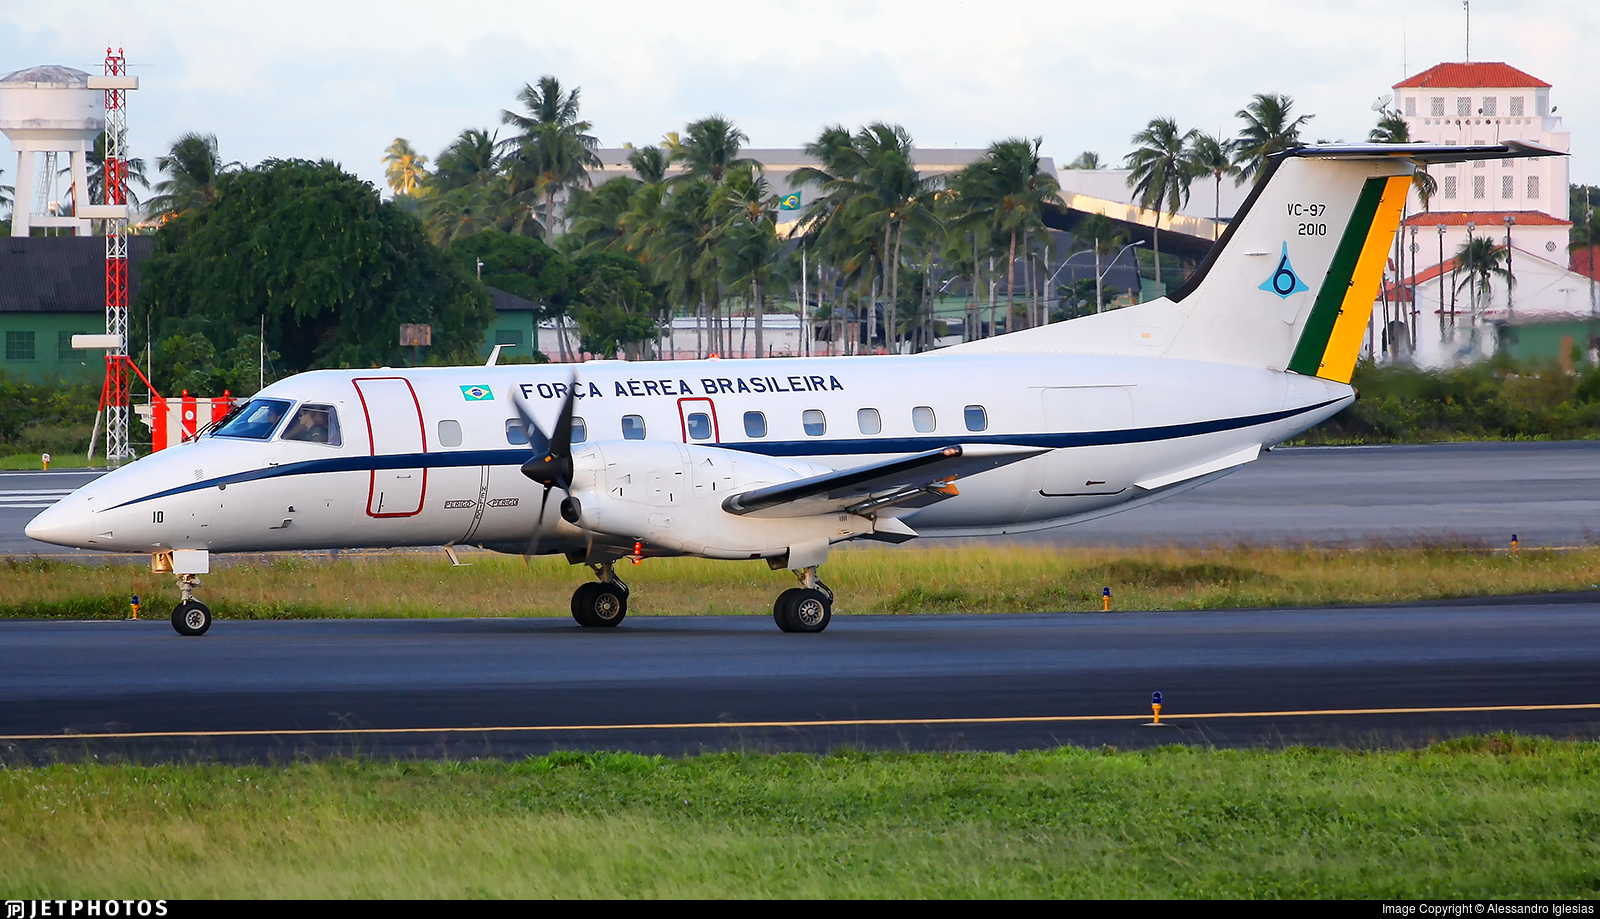 FAB2010 - Embraer VC-97 Brasilia - Brazil - Air Force